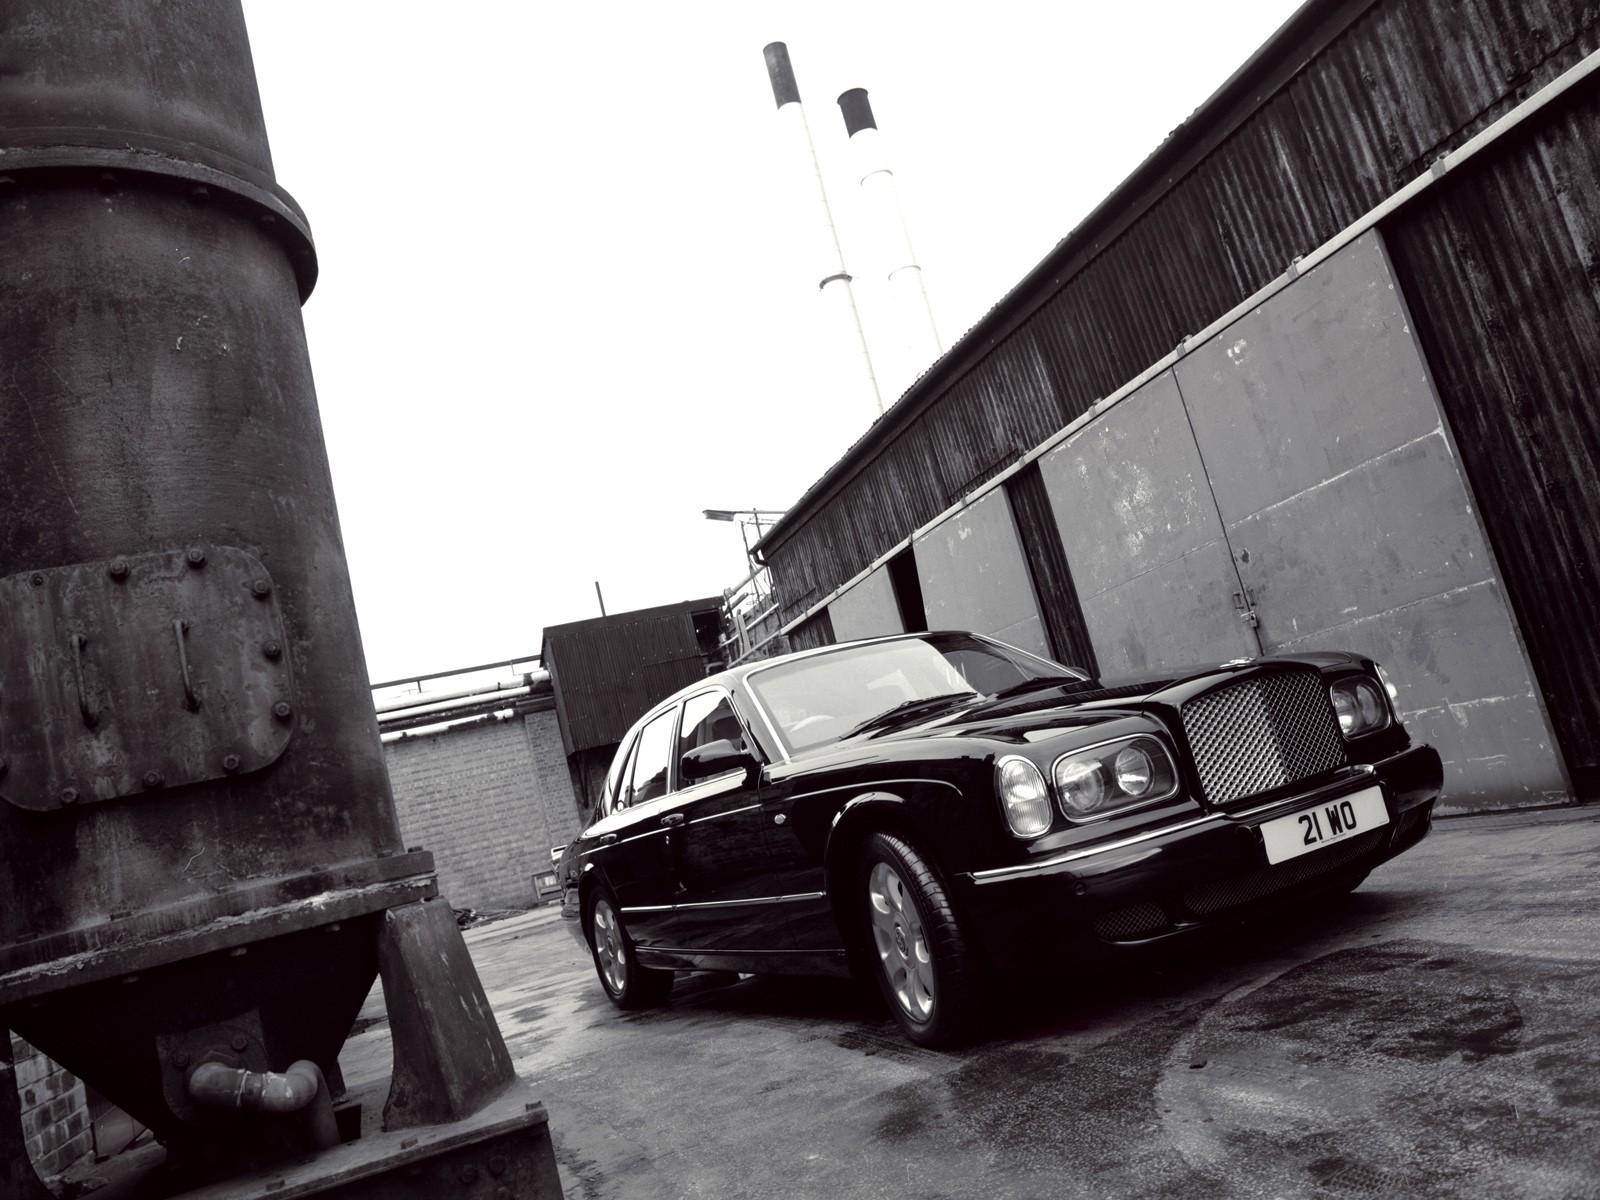 Картинка машины бандитские